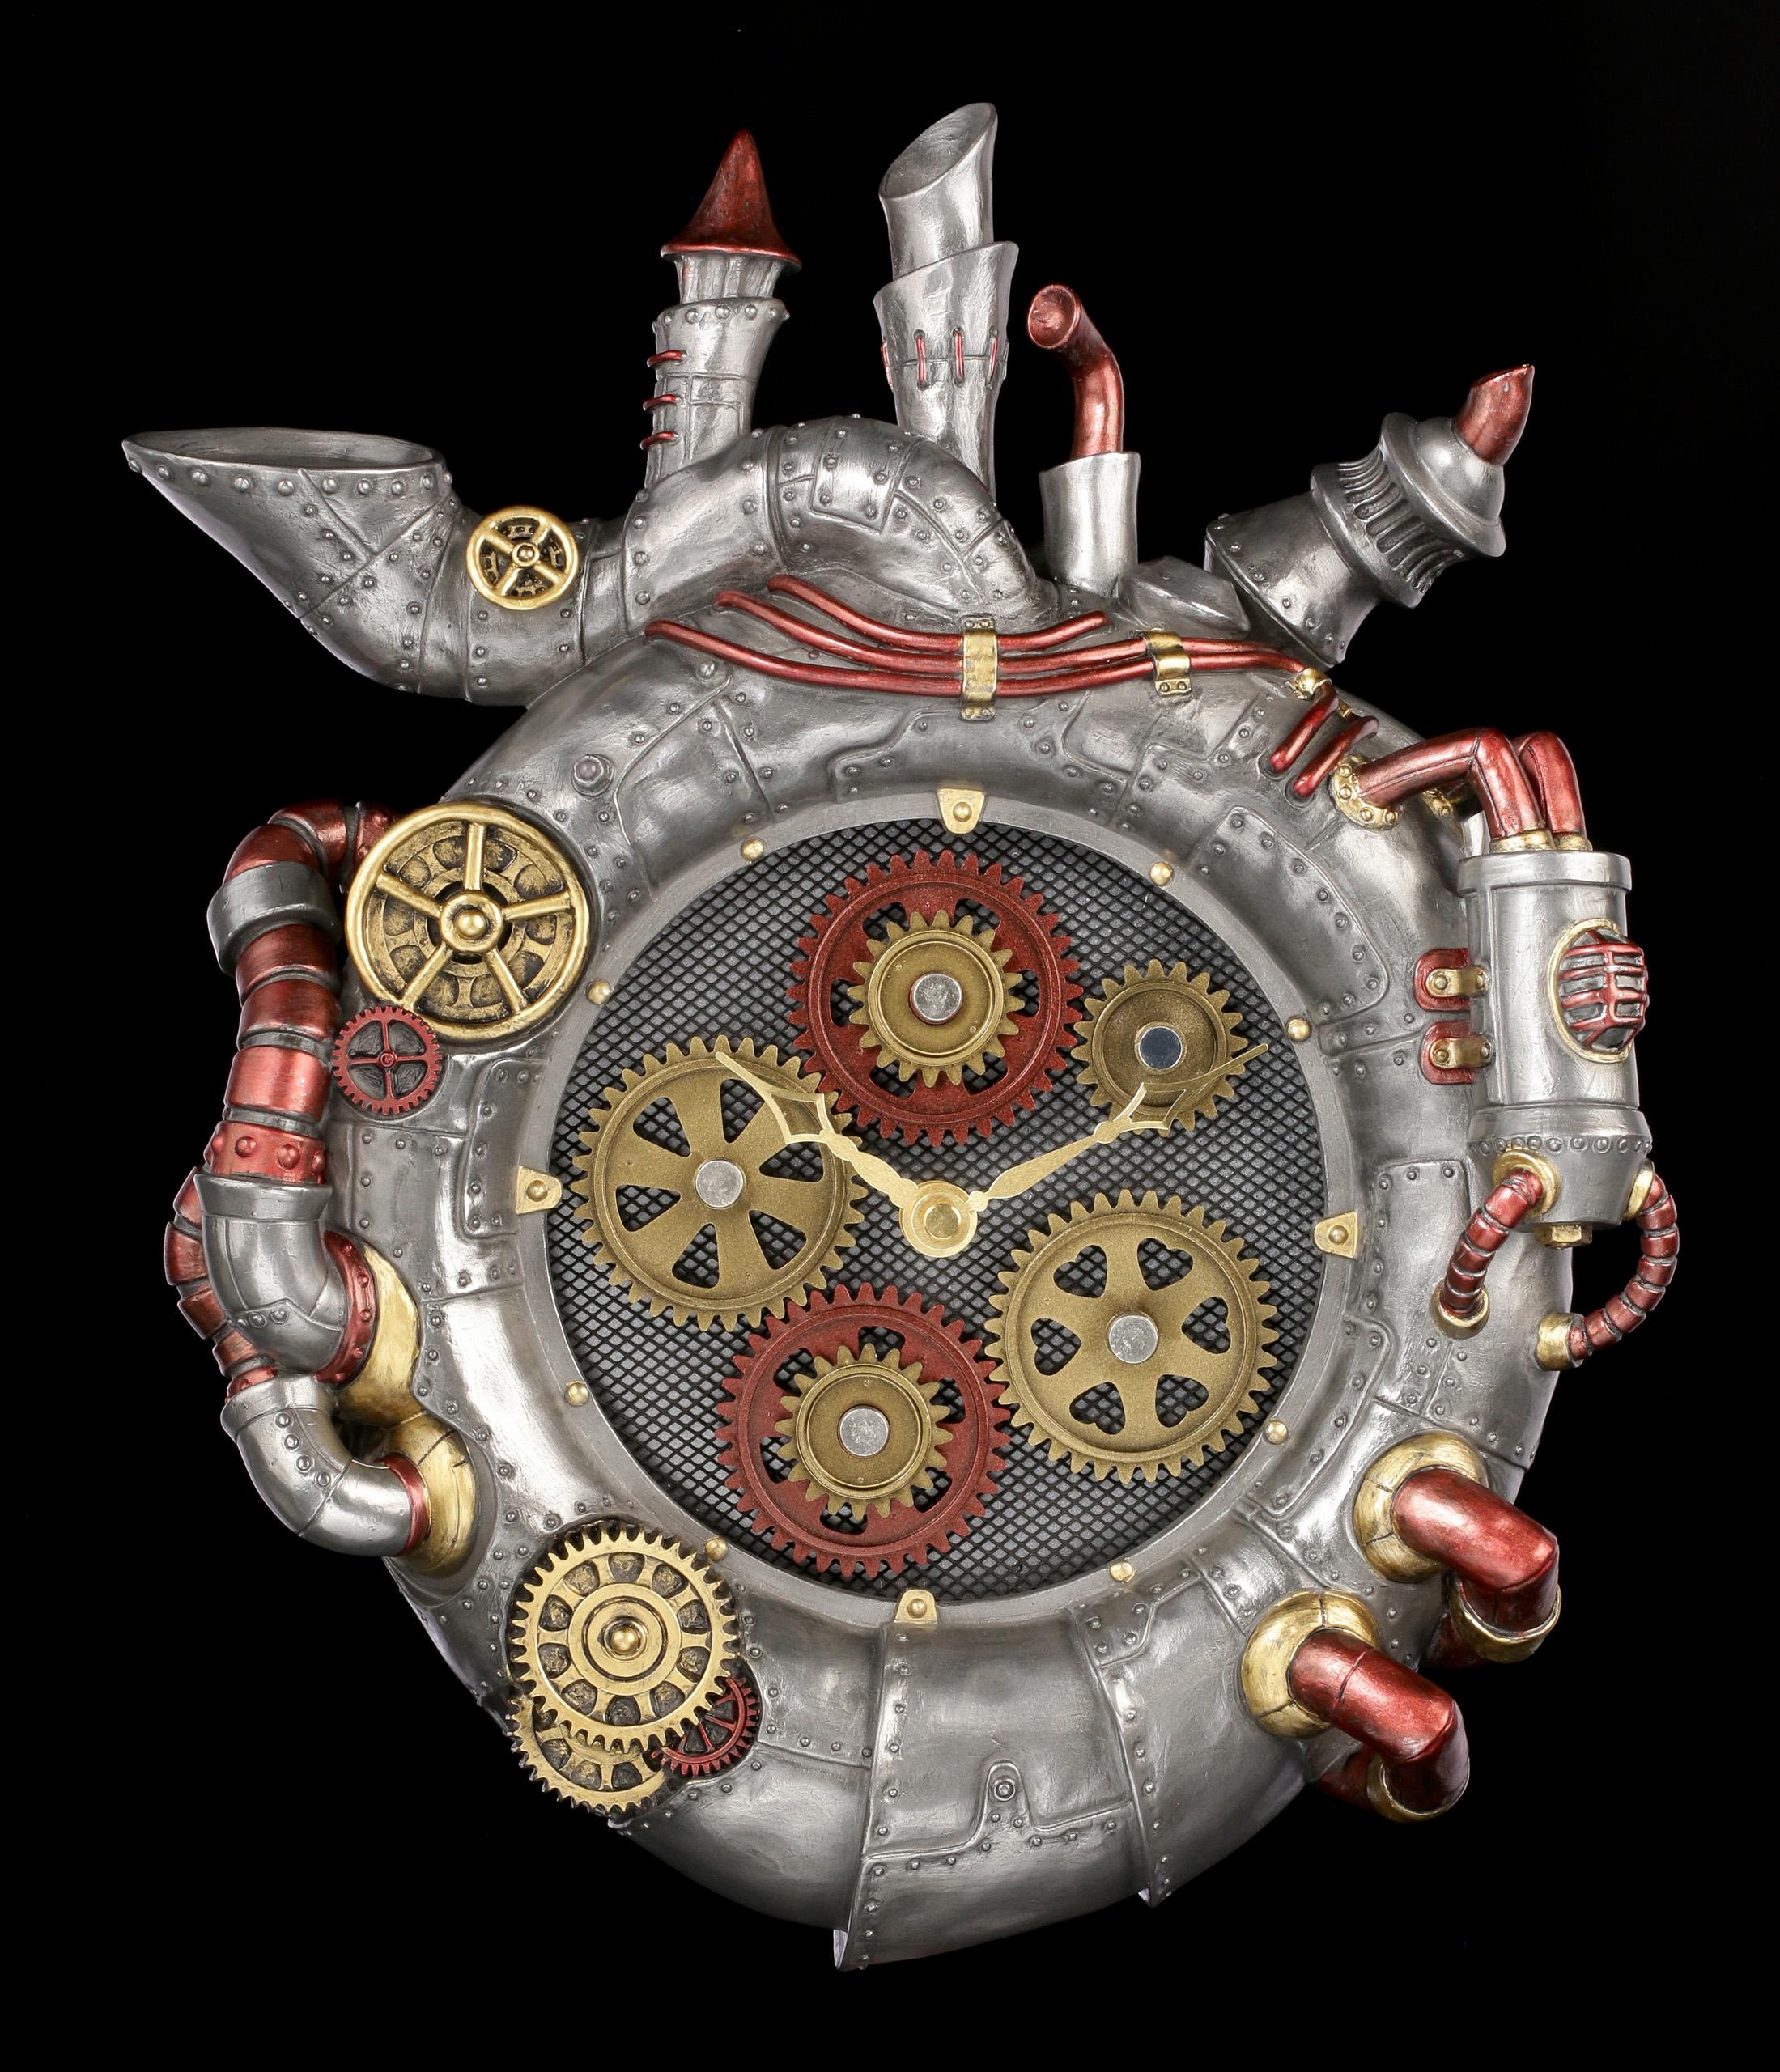 a817b723b798d Steampunk Heart Wall Clock